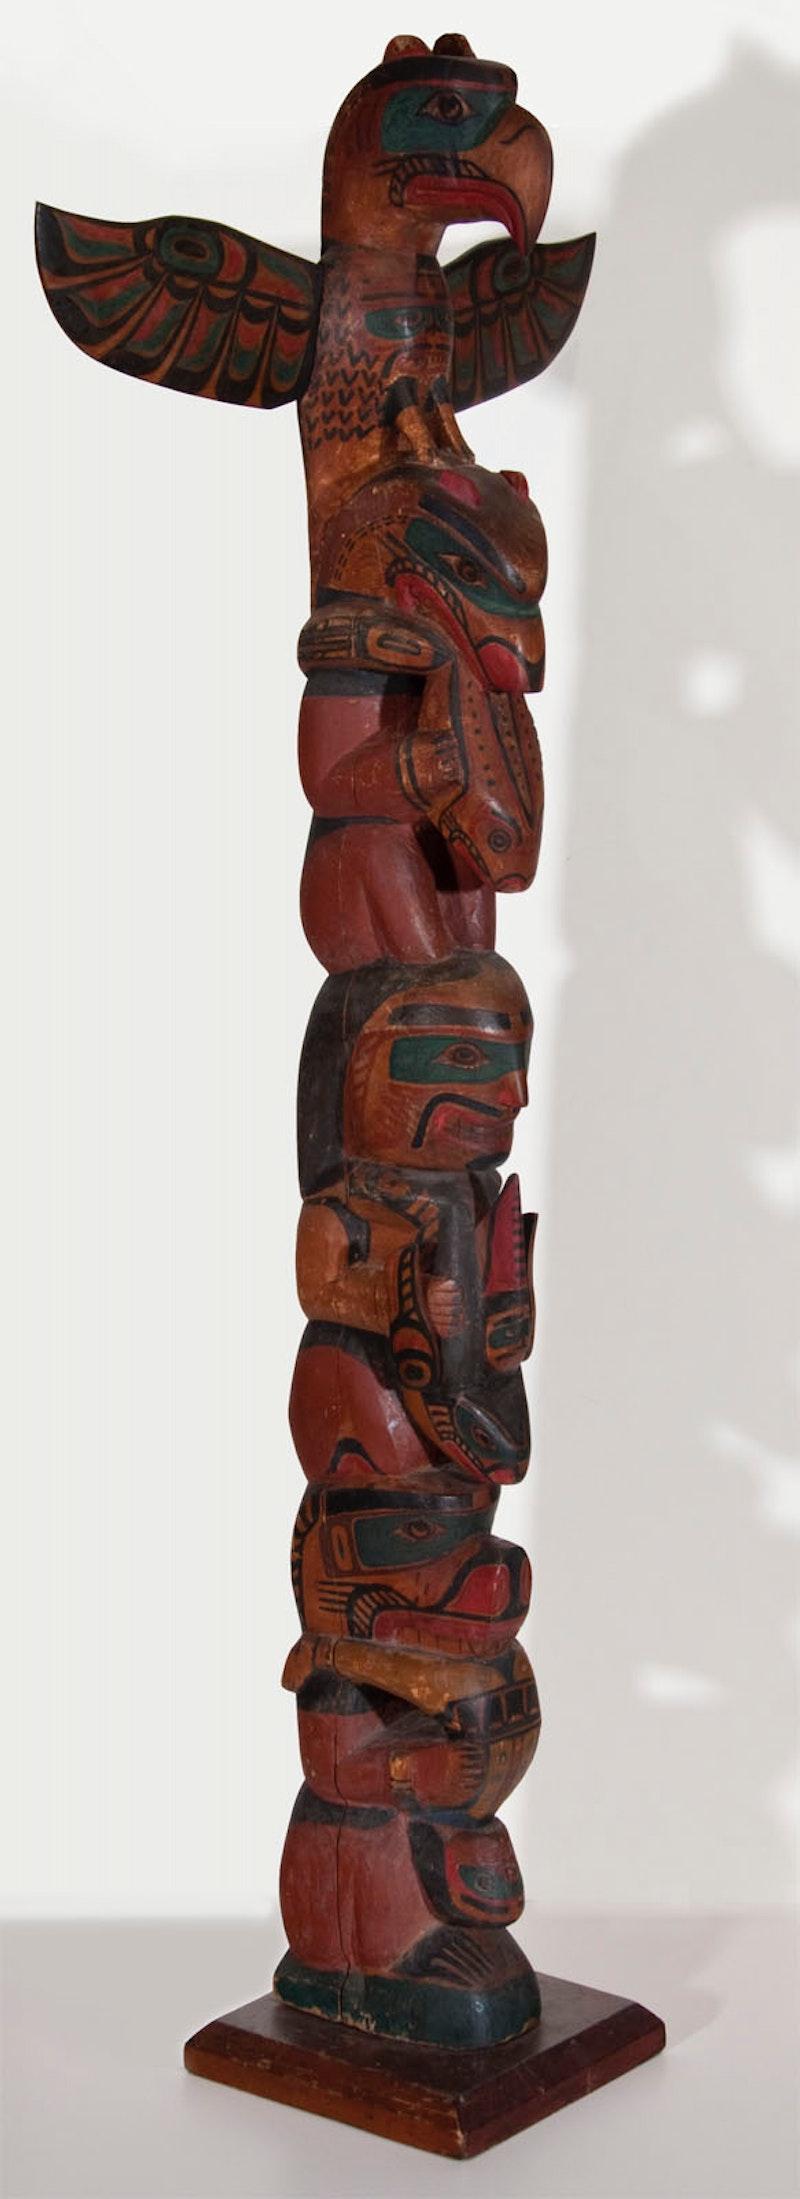 Alert Bay Totem Image 1